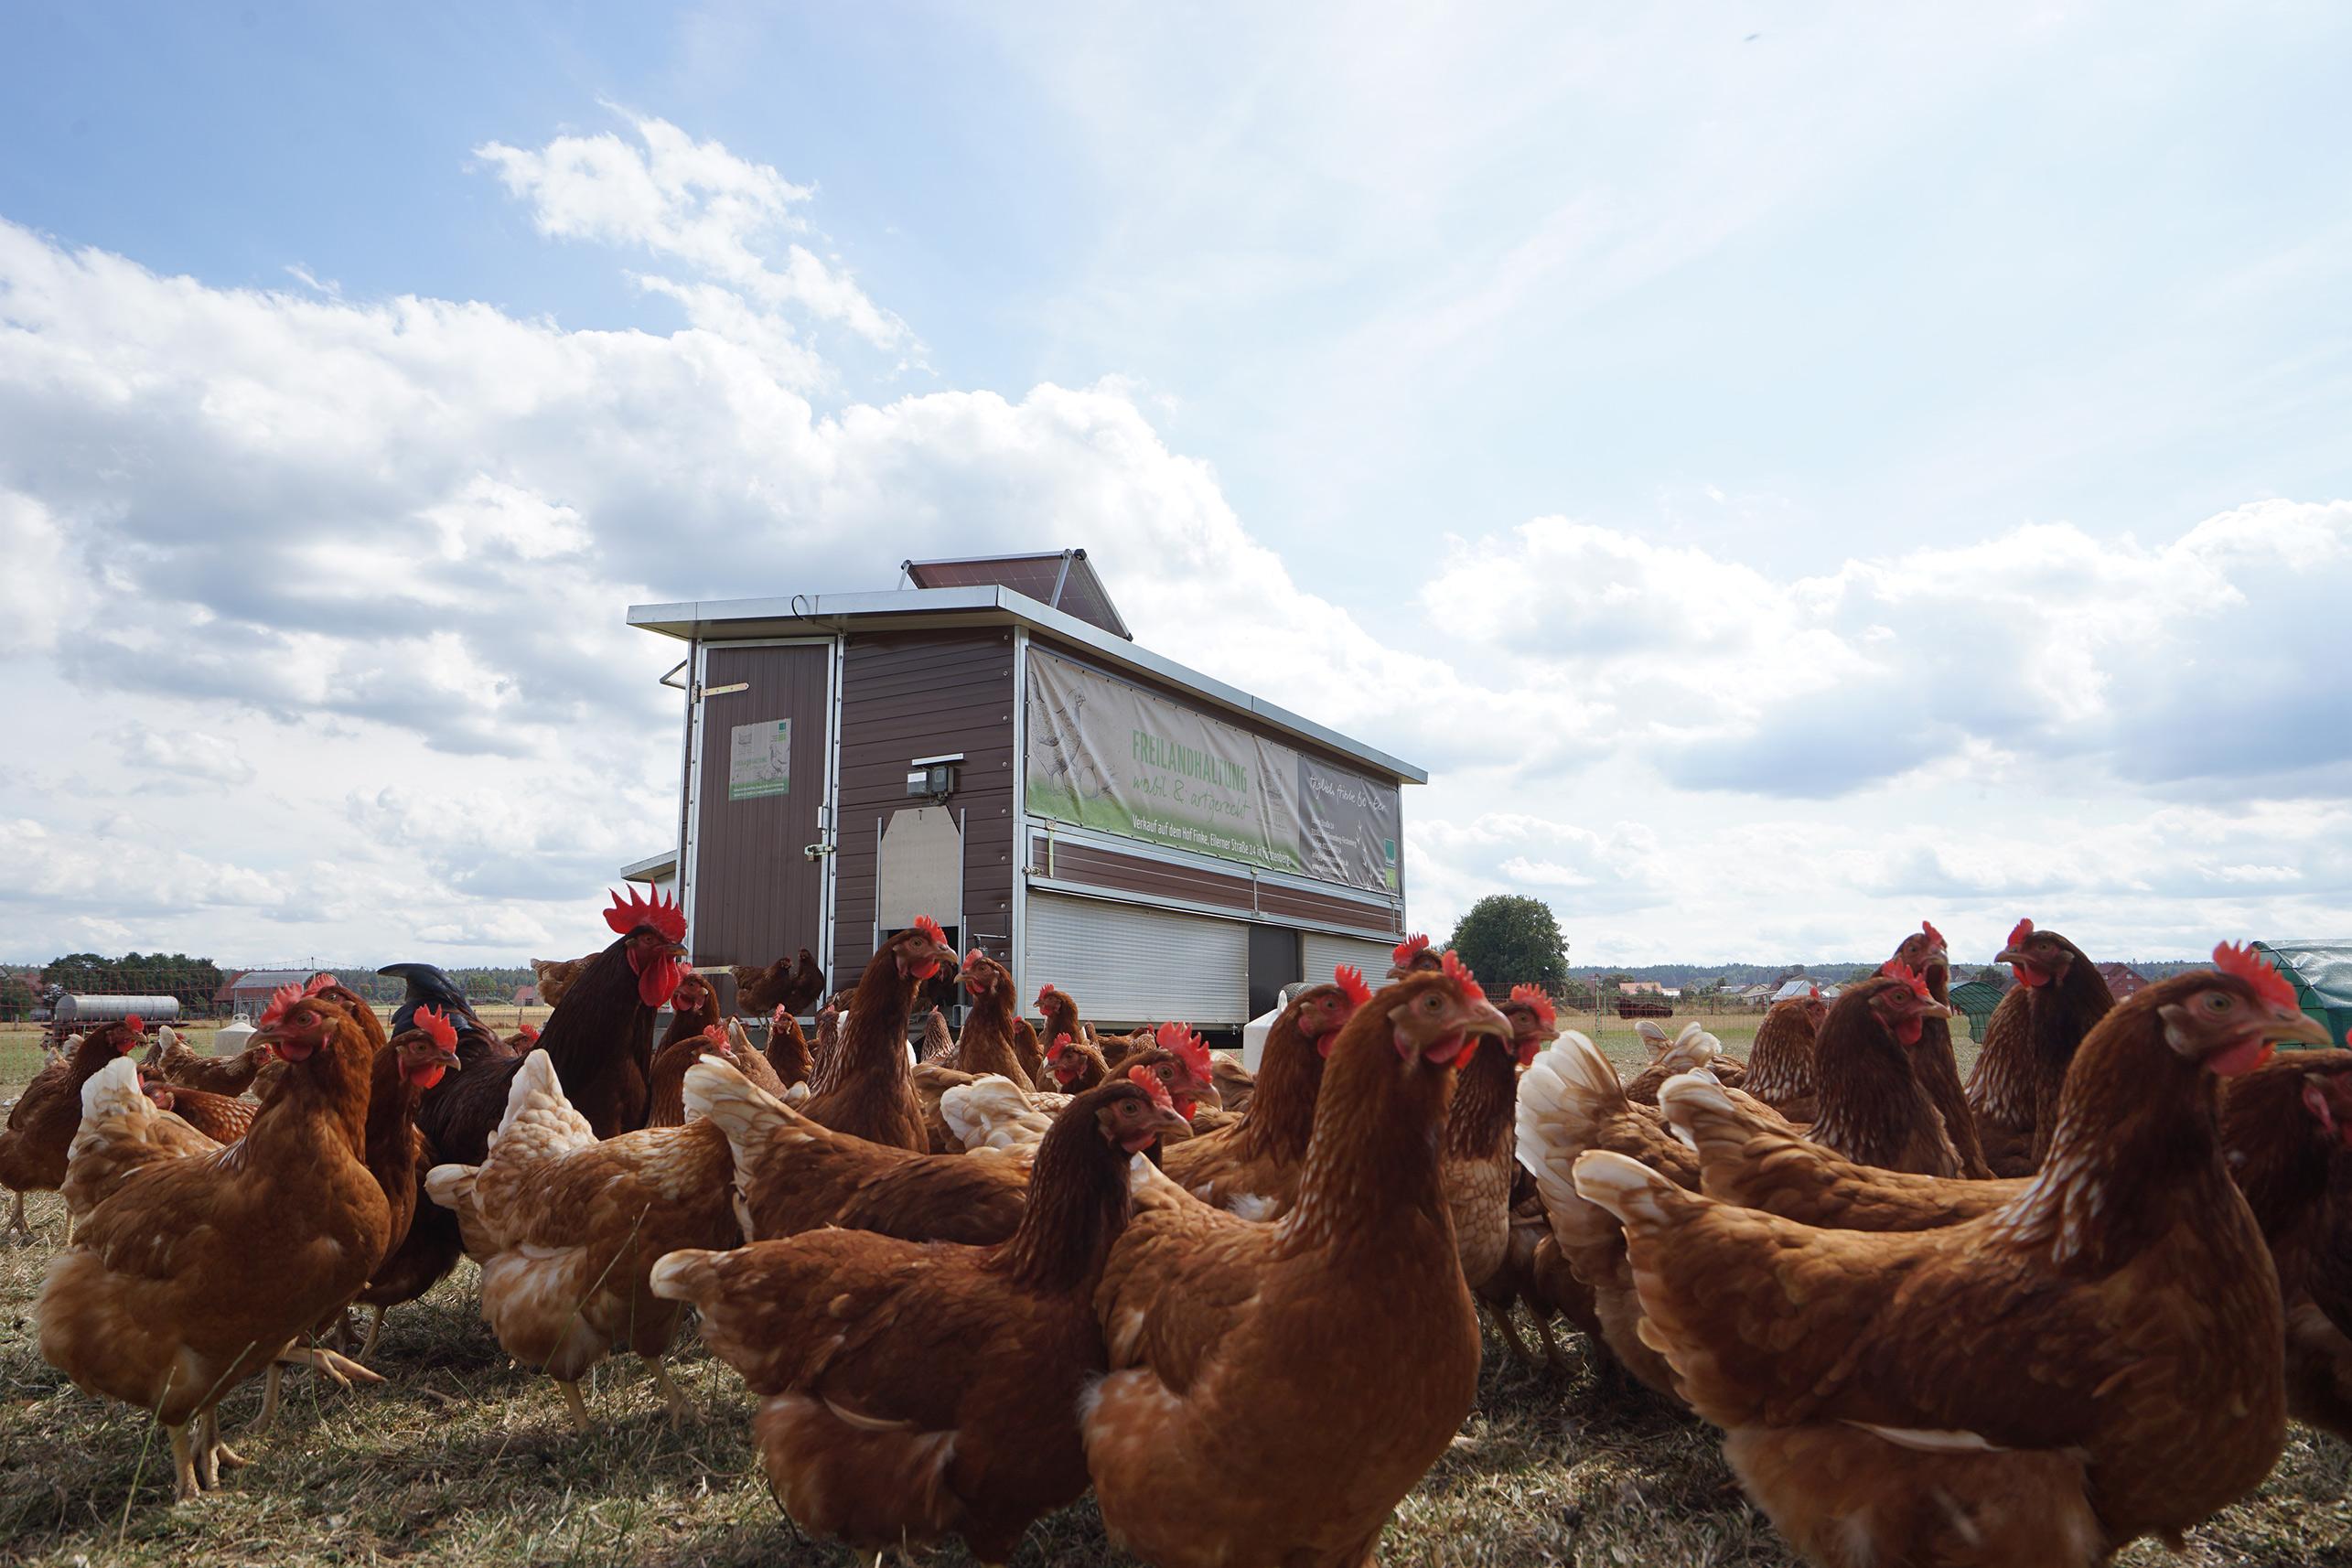 Hühnermobil mit Hühner (Biohof Finke)